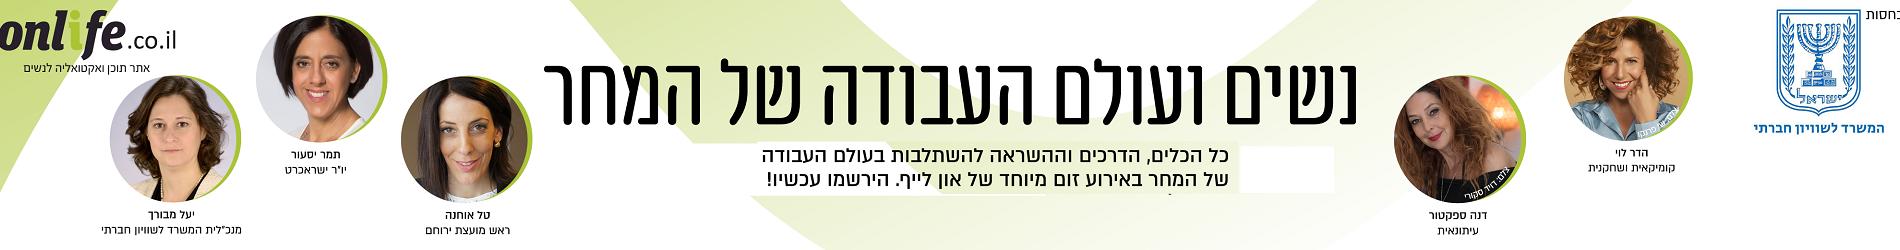 collaboration cover